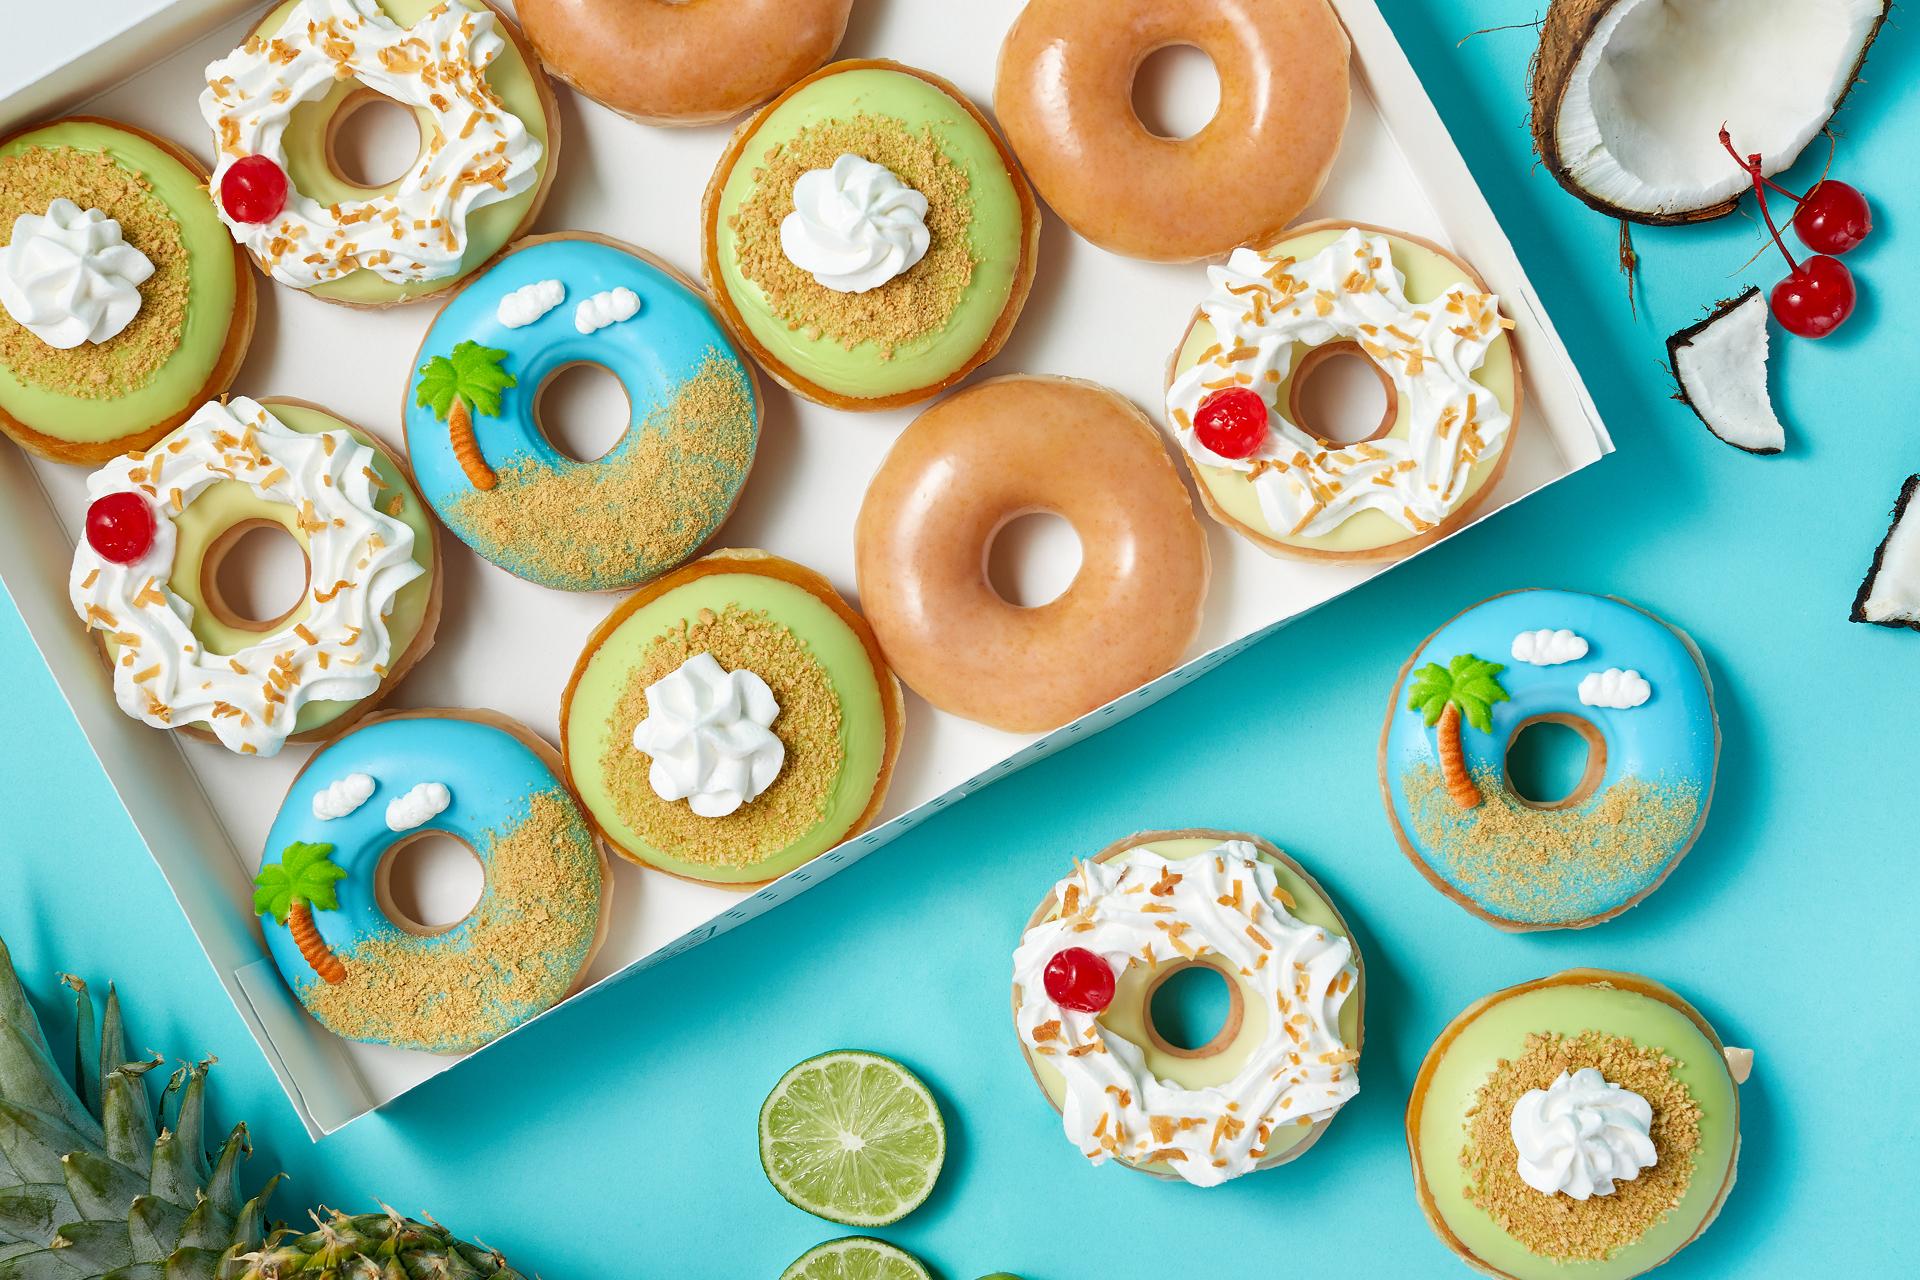 Krispy Kreme's Island Time Collection